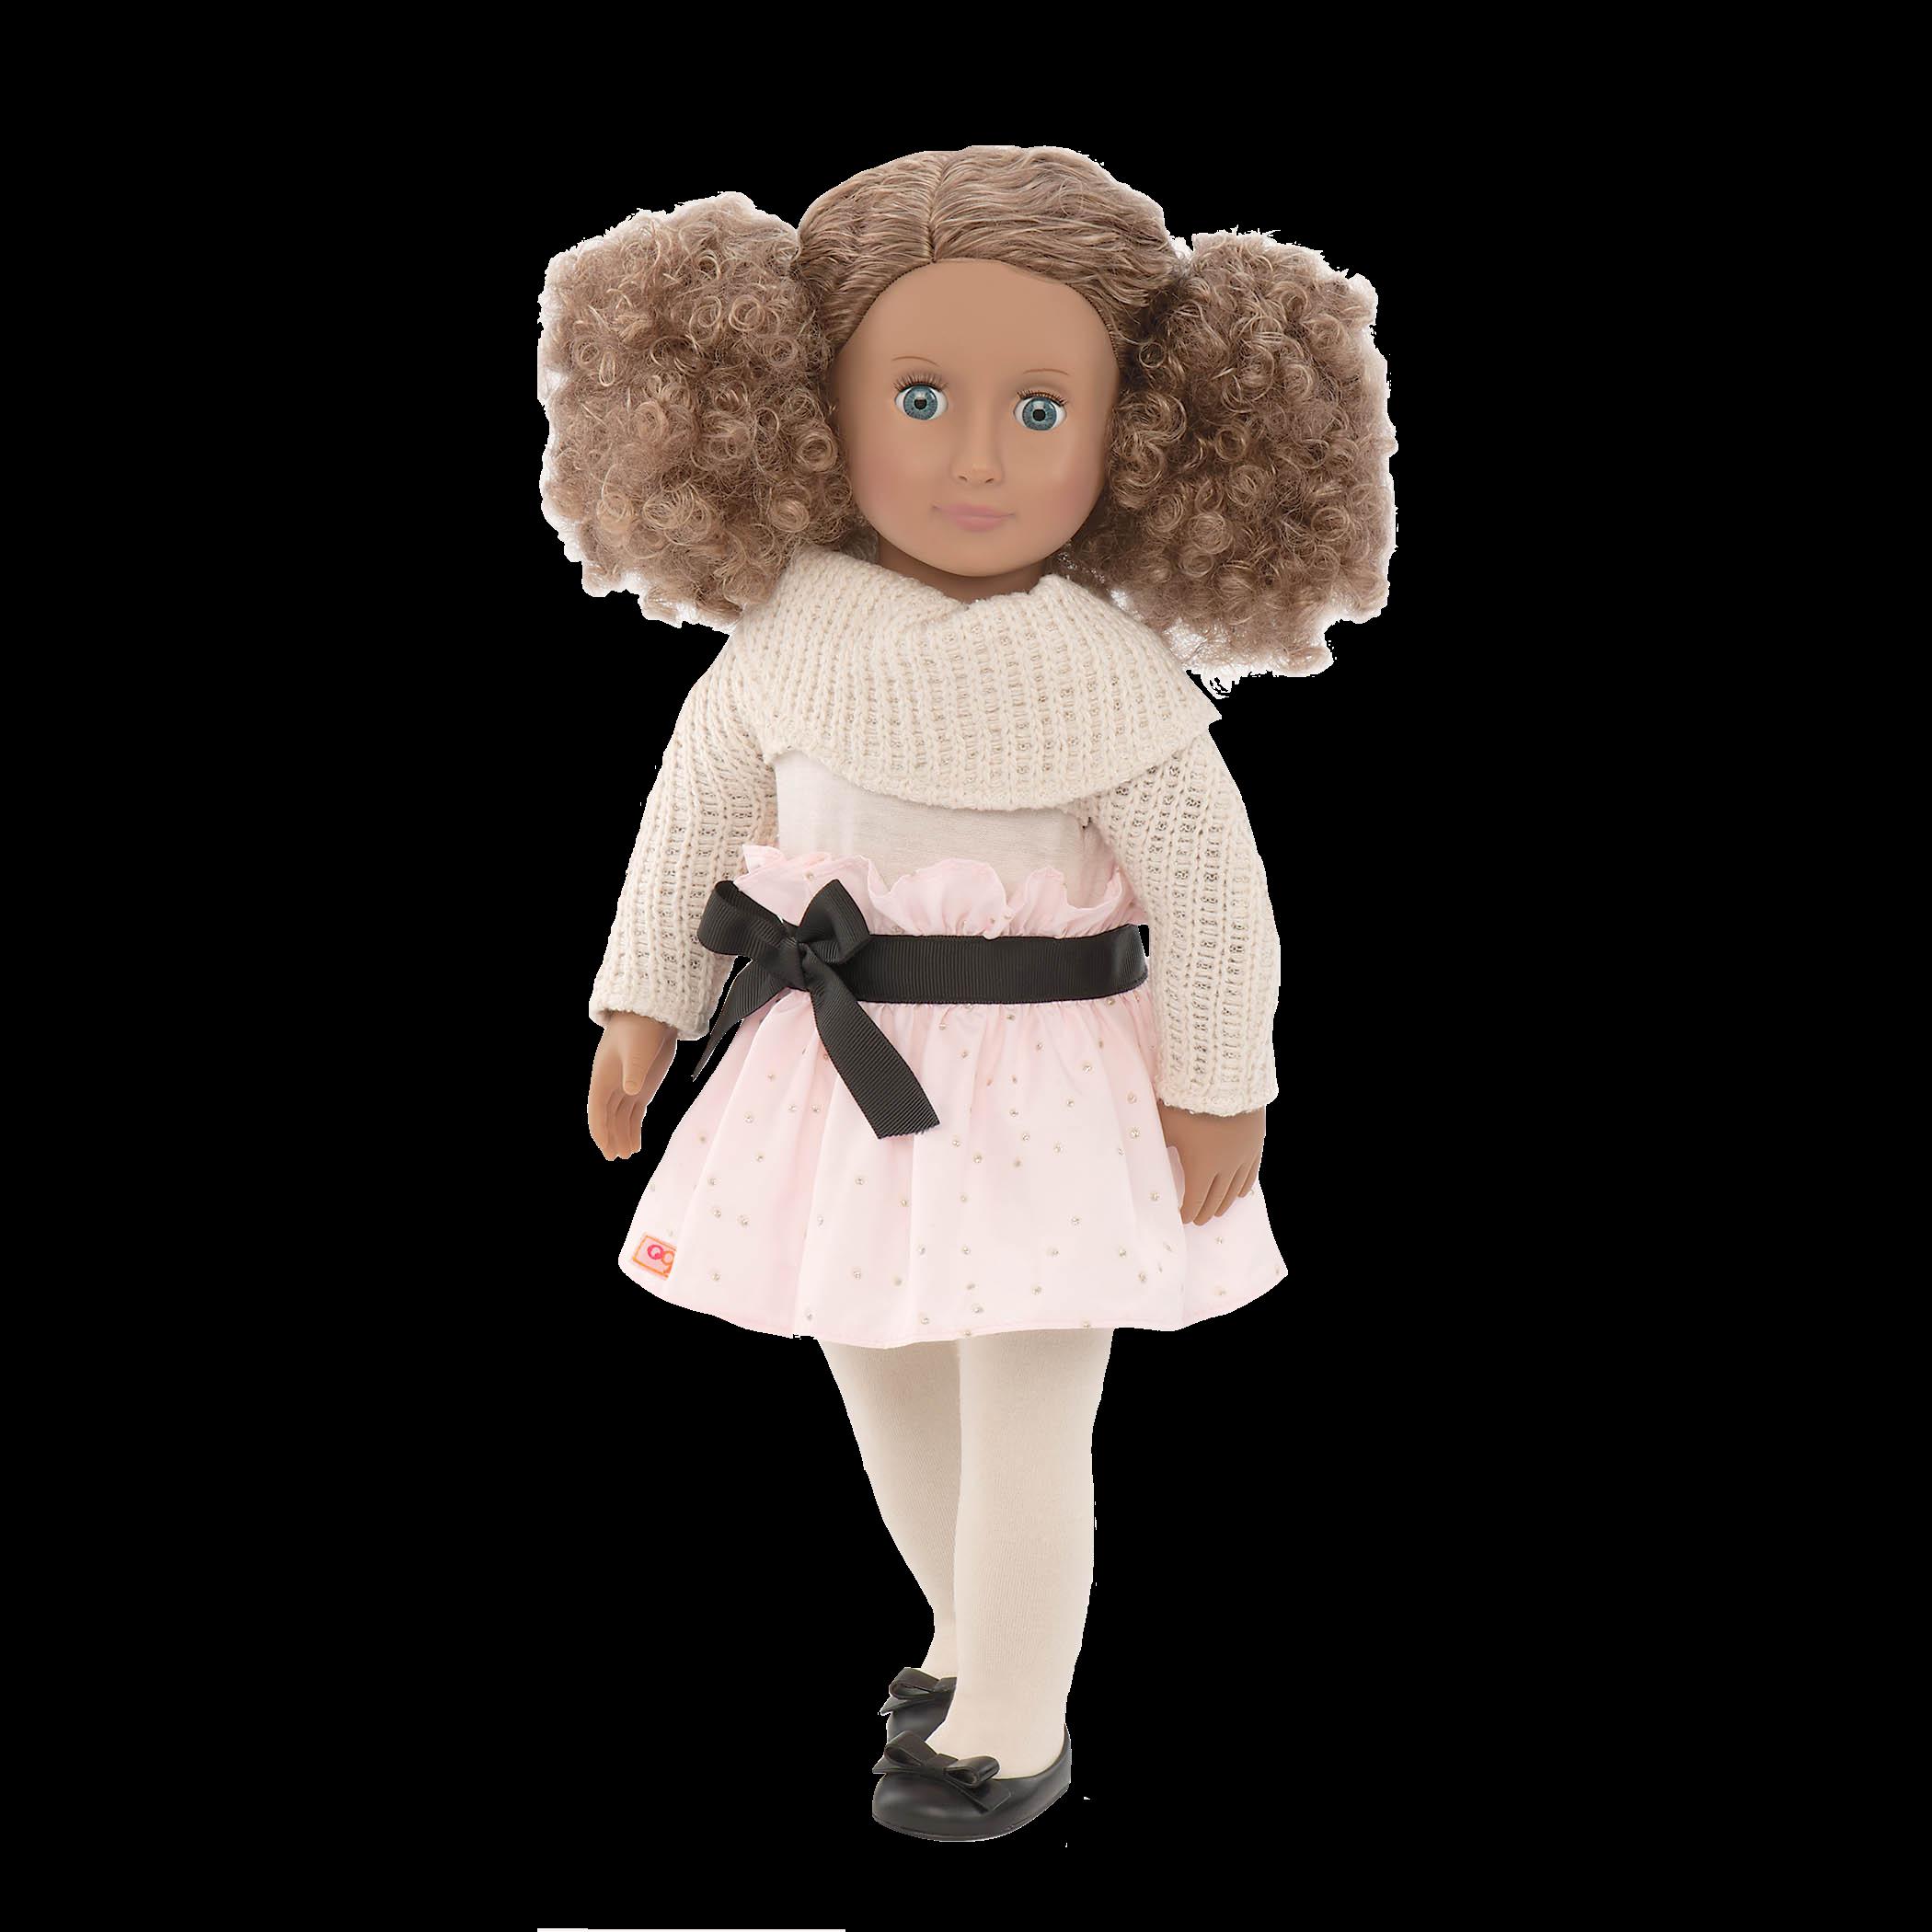 Kaylee 18-inch Doll